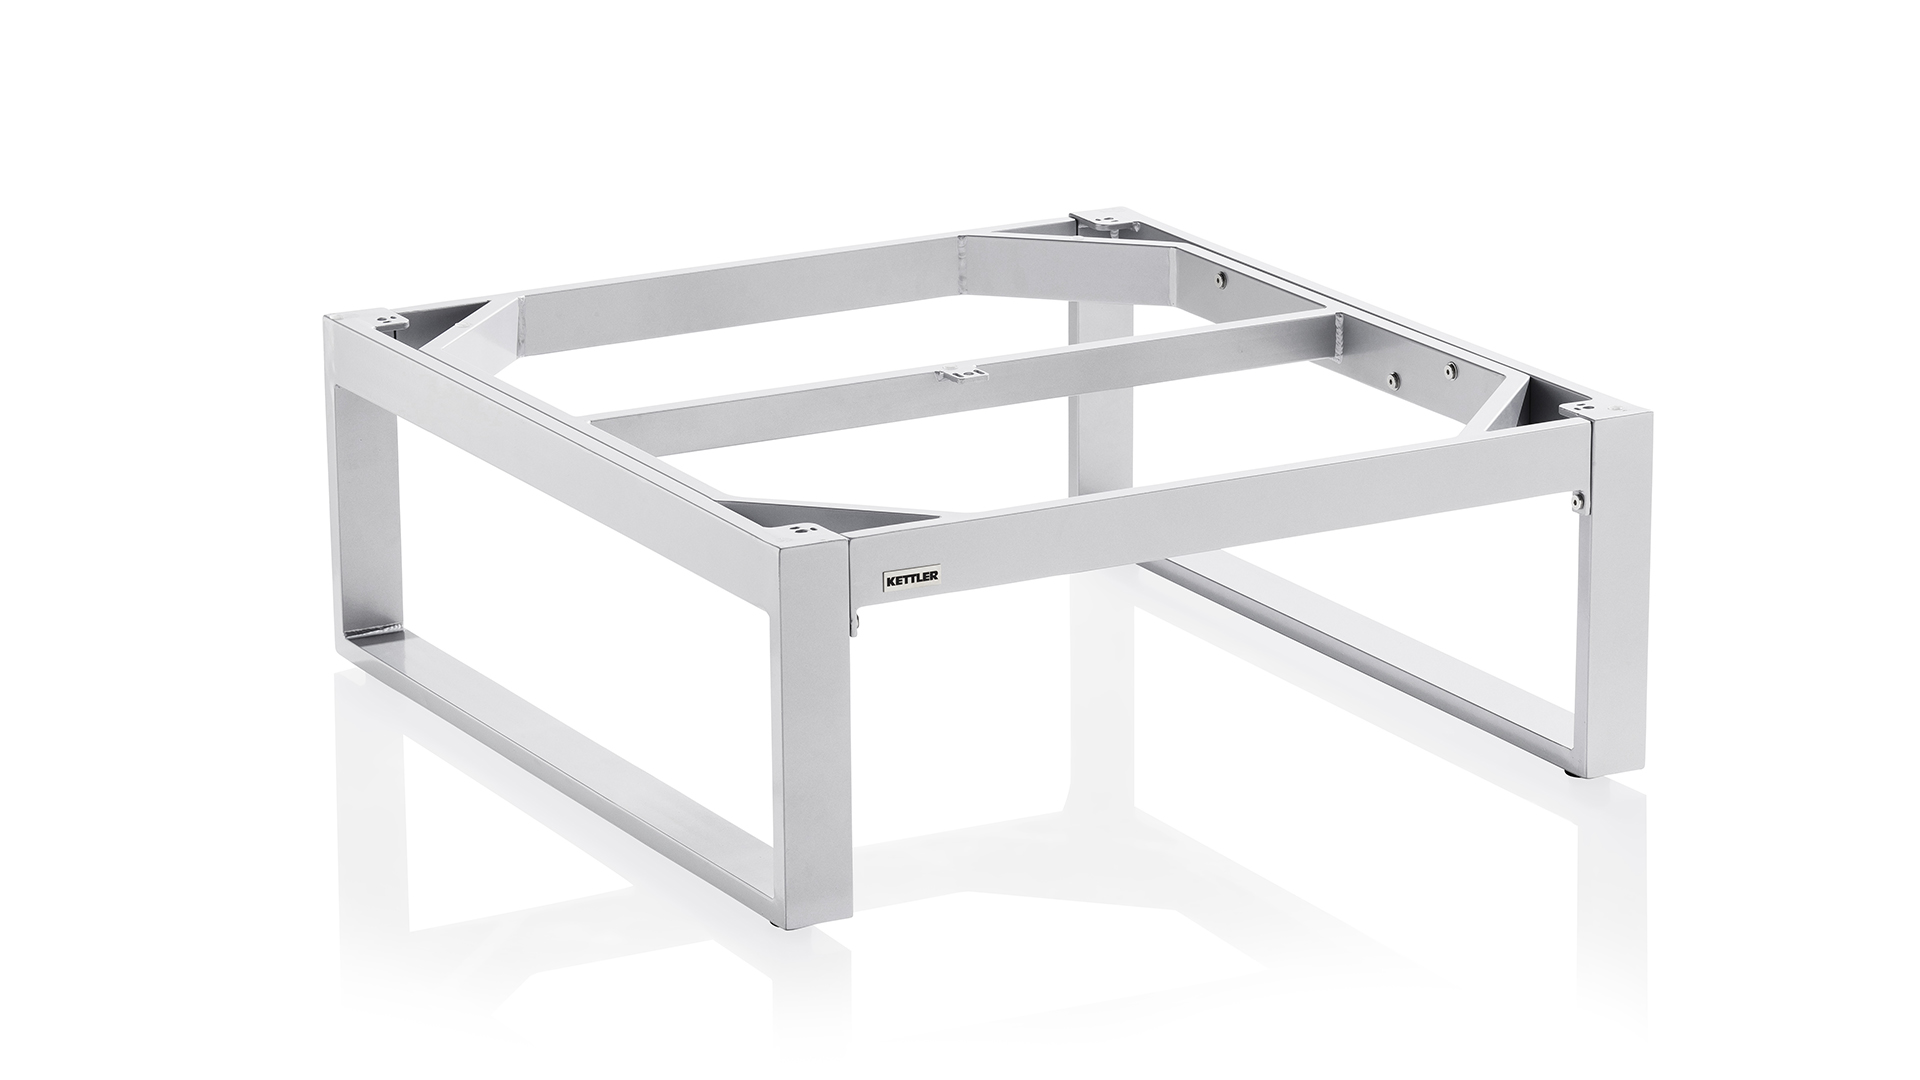 EGO Lounge Tischgestell 95 x 95 cm